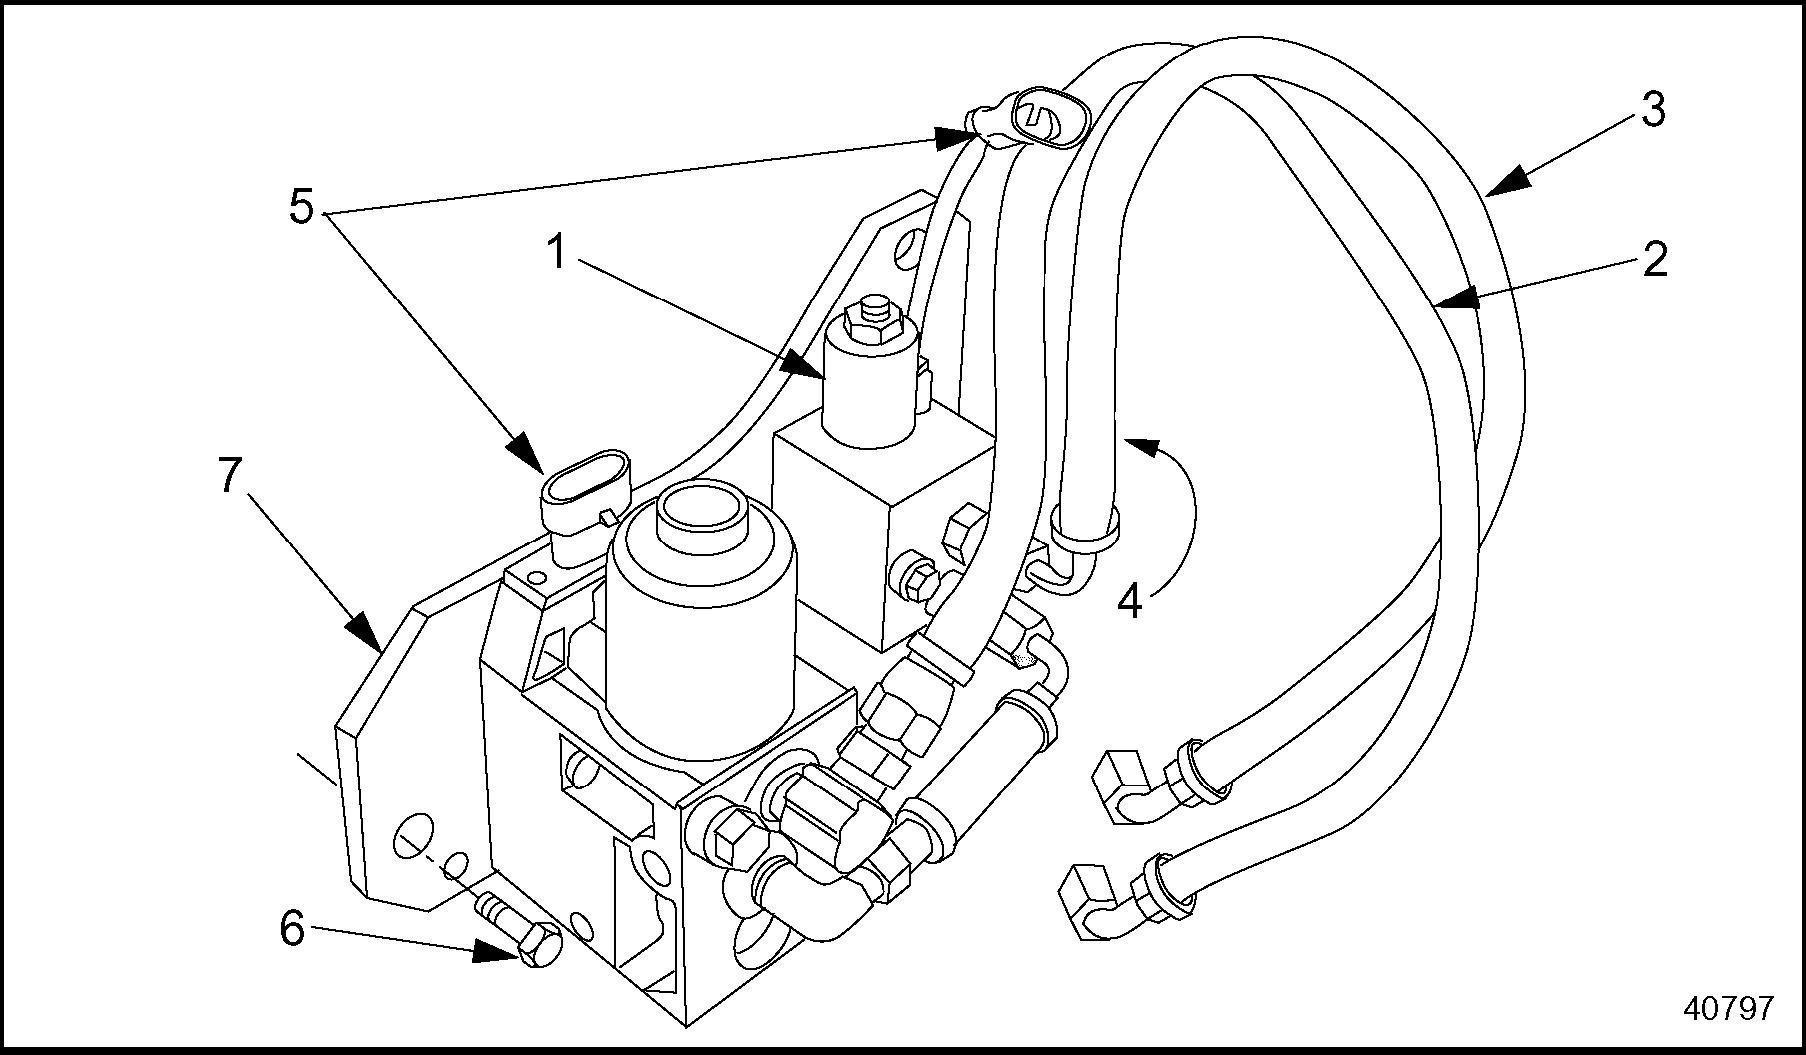 freightliner ecm location pictures  parts  wiring diagram images